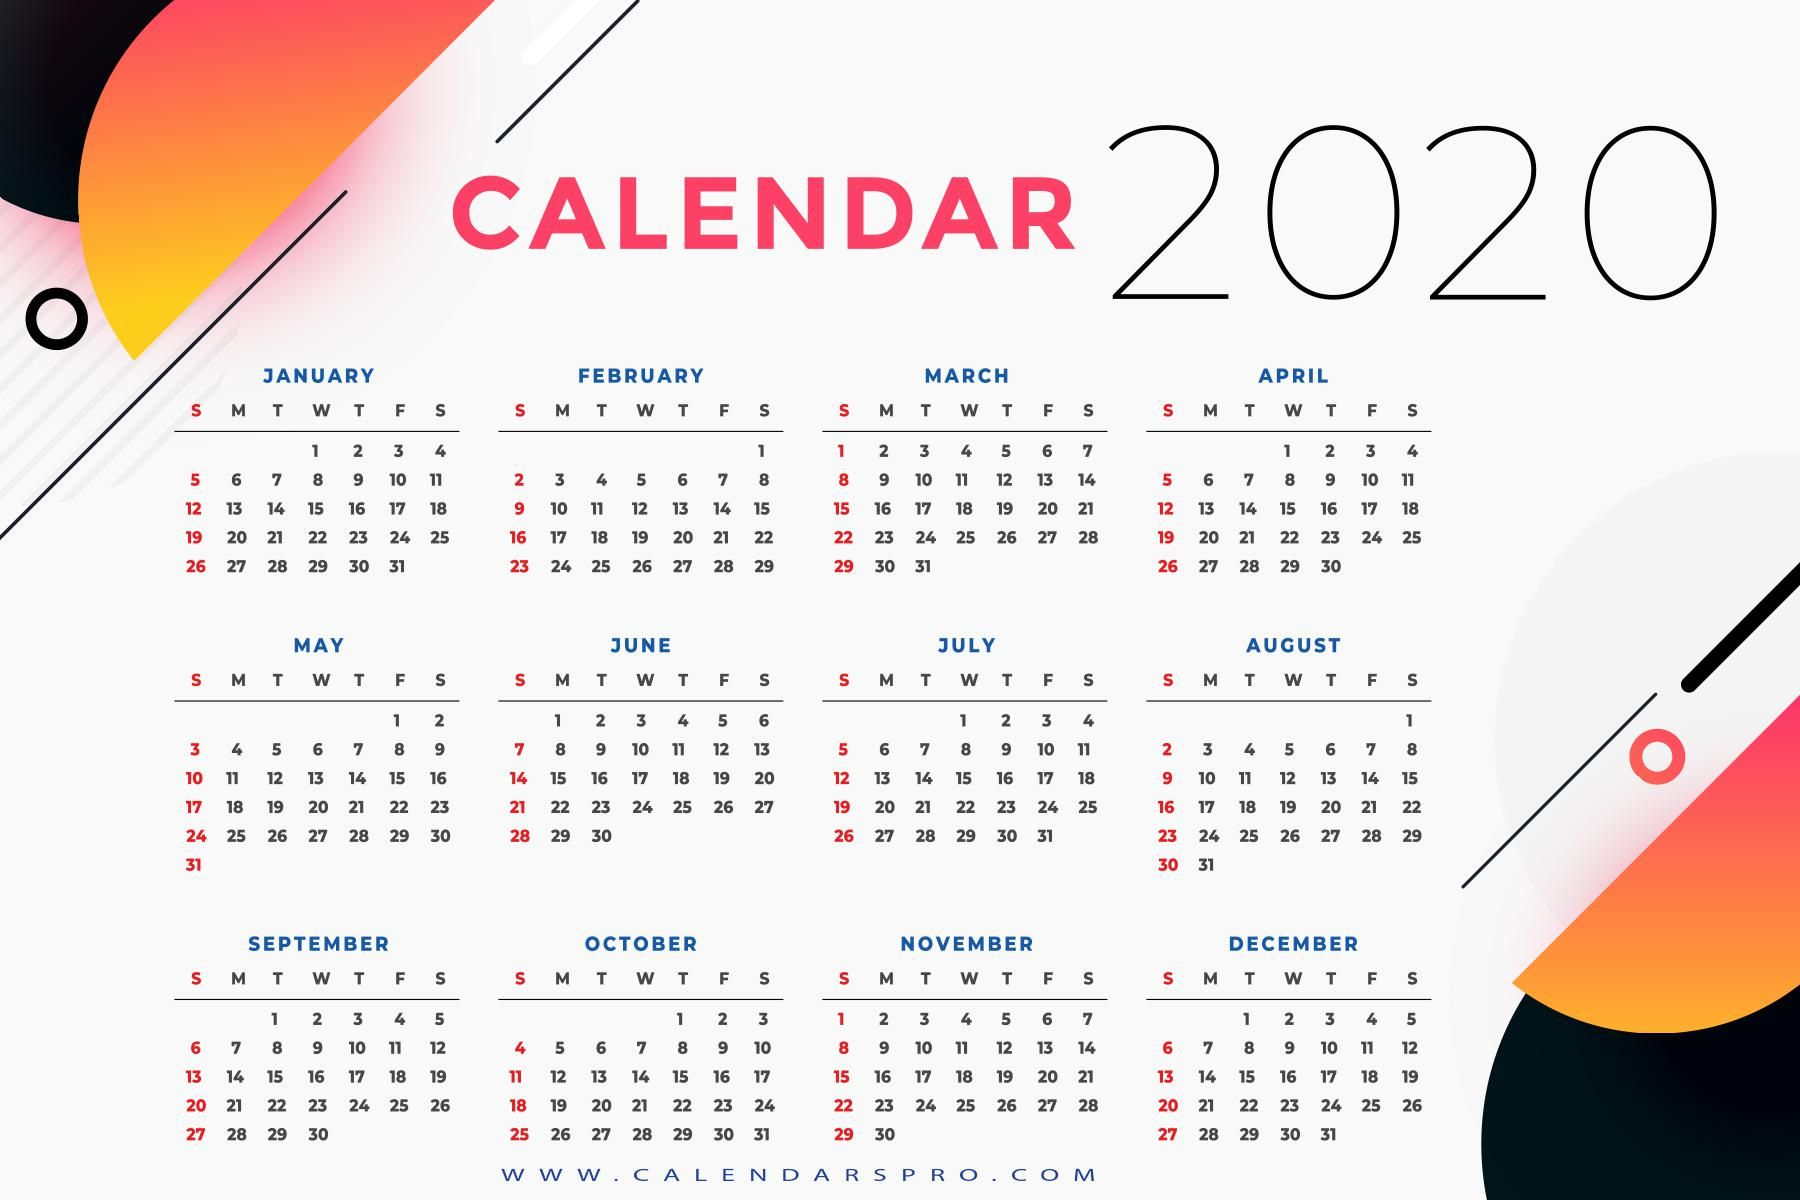 Diwali 2020 Date, Onam 2020, Guru Purnima, Dussehra 2020 within 2020 Ugadi Date